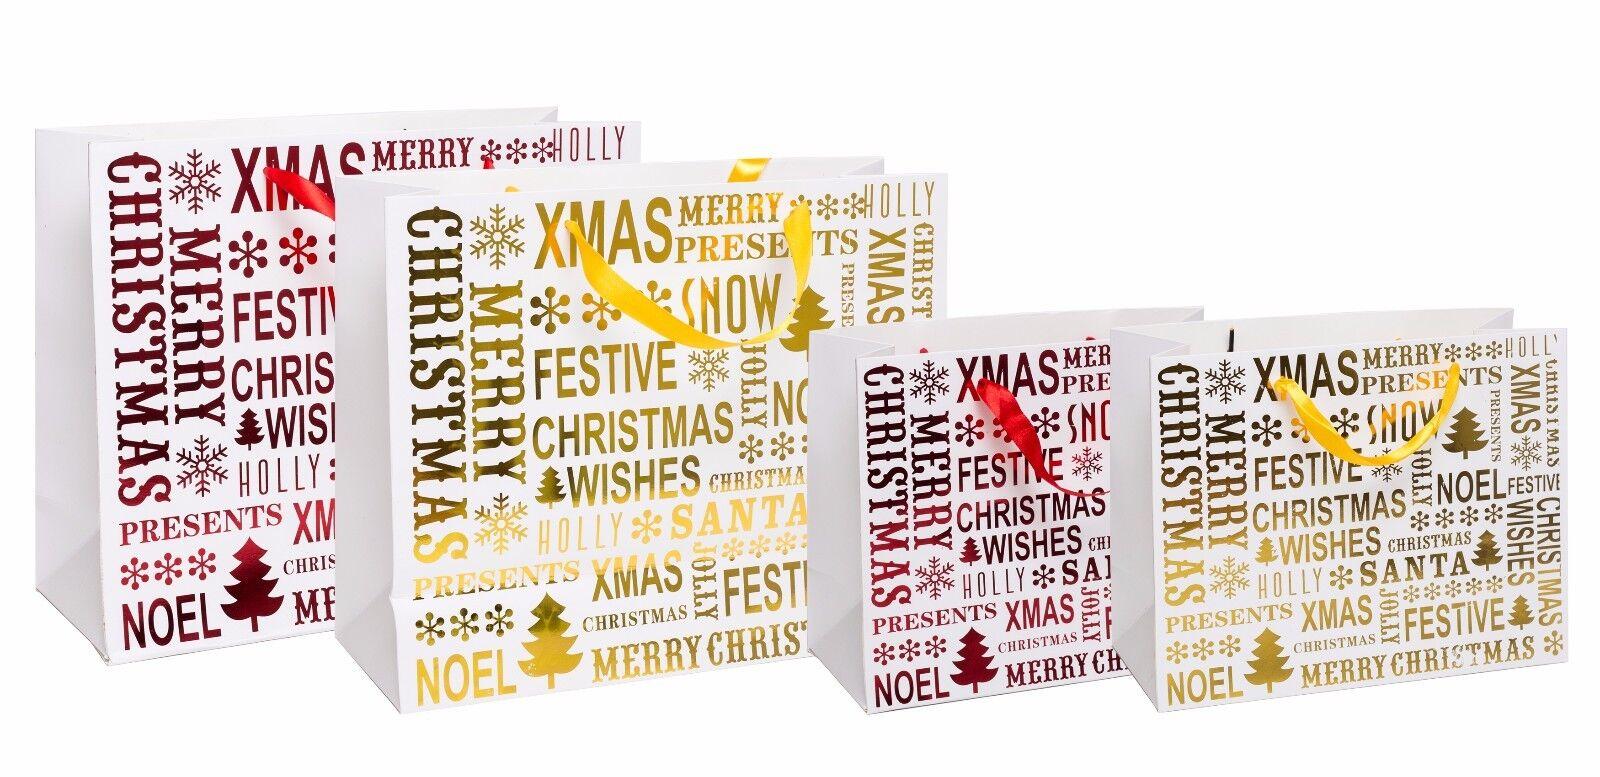 Luxury Luxury Luxury Christmas Carta Pacco Regalo Assortiti Babbo Natale Vacanza con 74608d